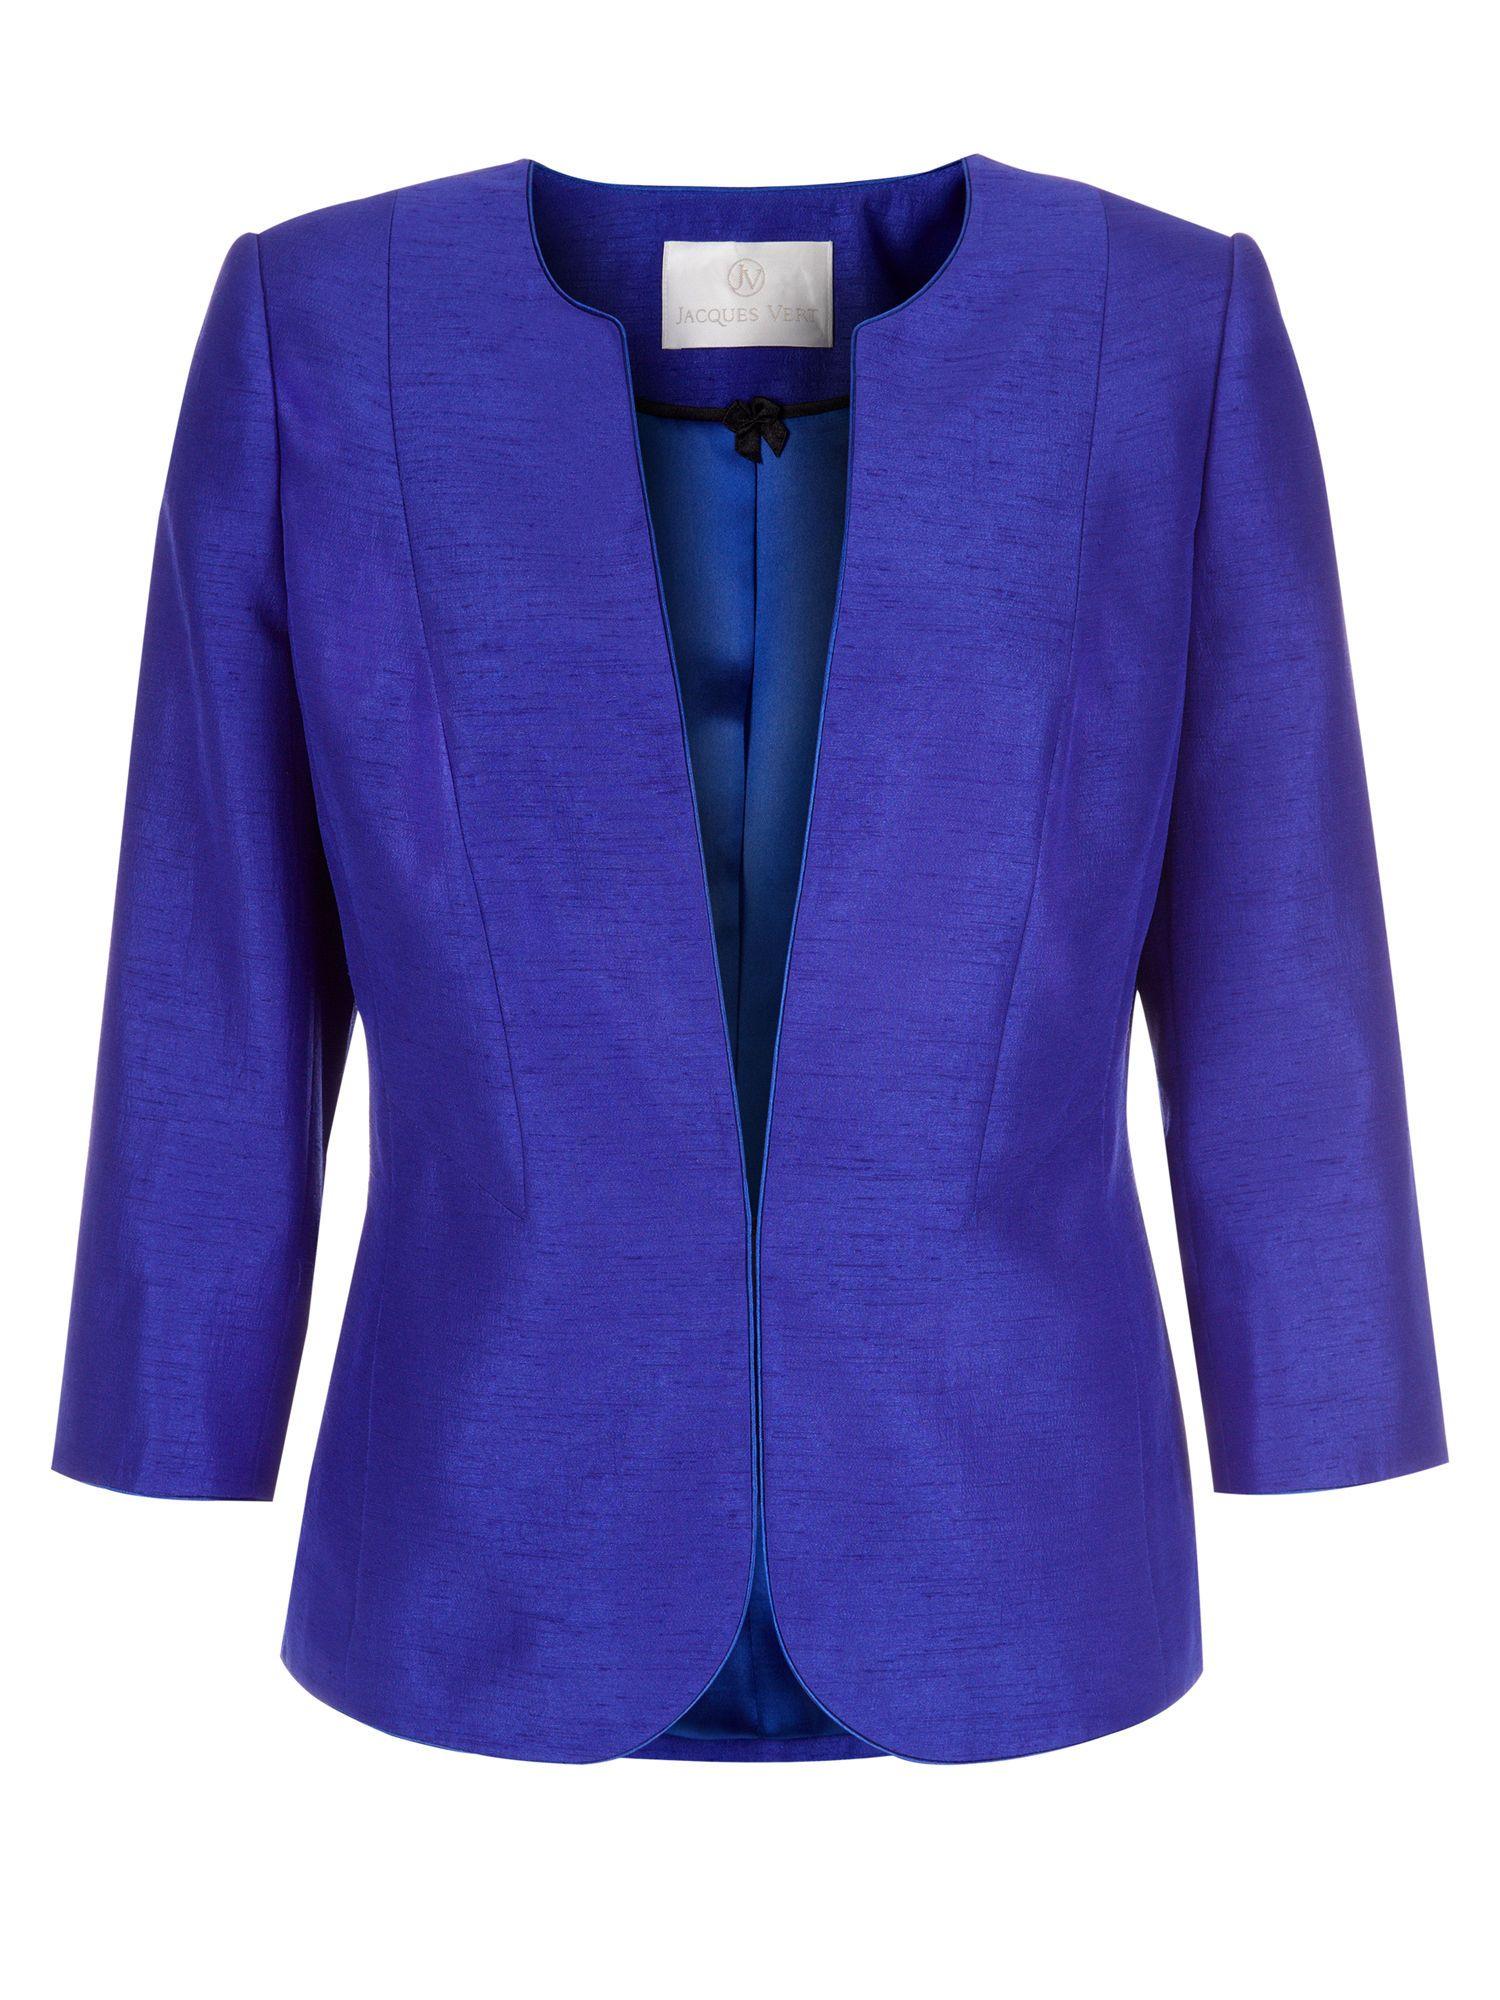 Jacques vert elegant collarless jacket style clothes pinterest